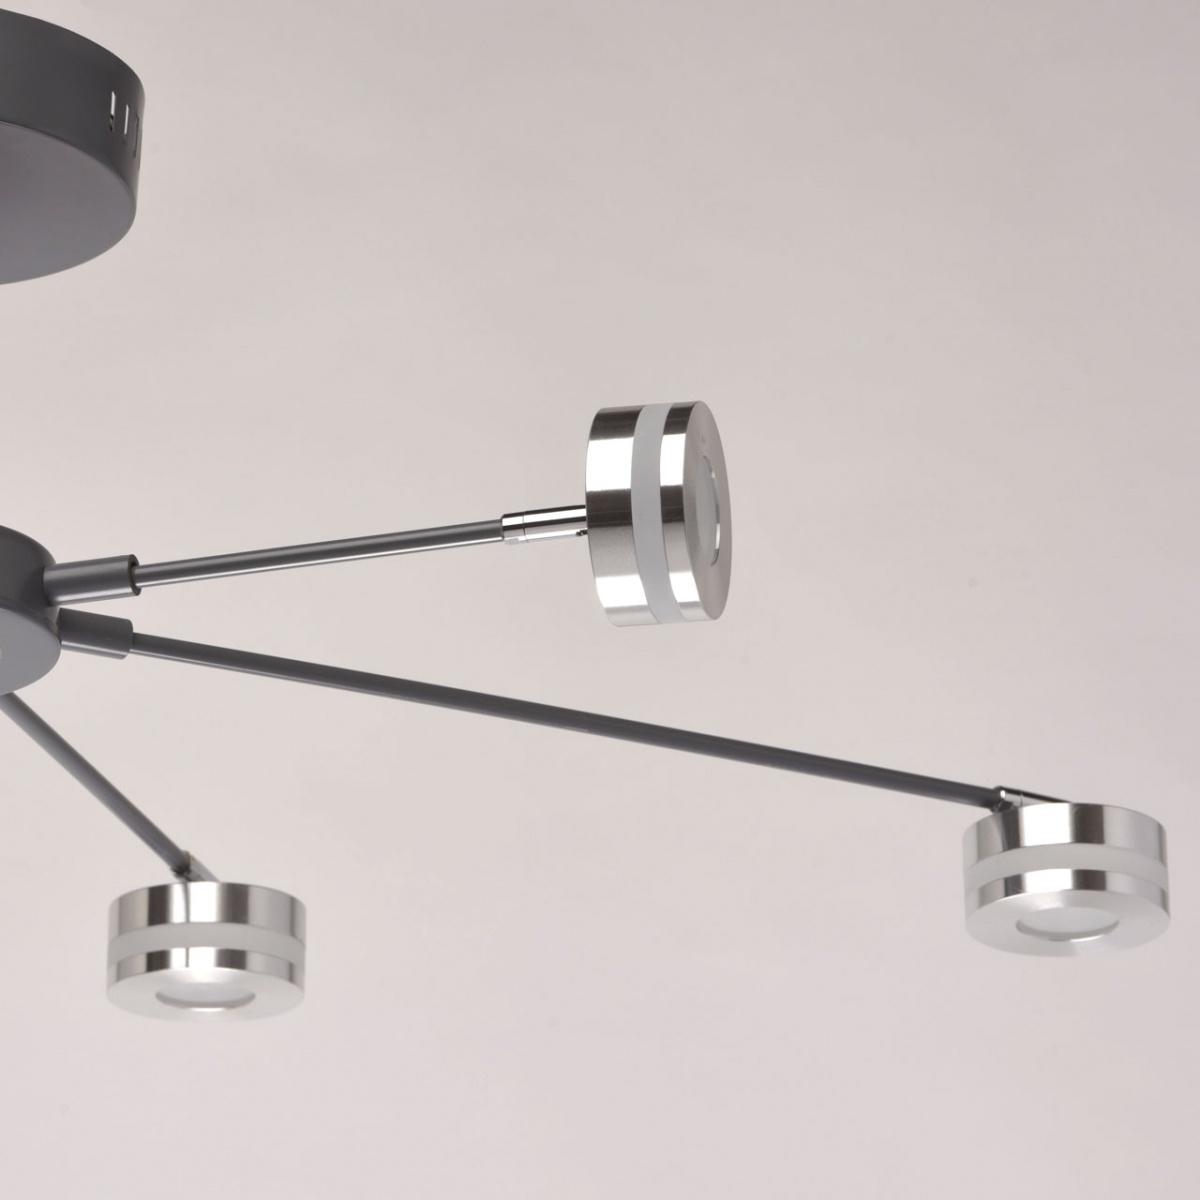 Nowoczesna Lampa Sufitowa Led Na 6 żarówek Regenbogen Techno Sklep